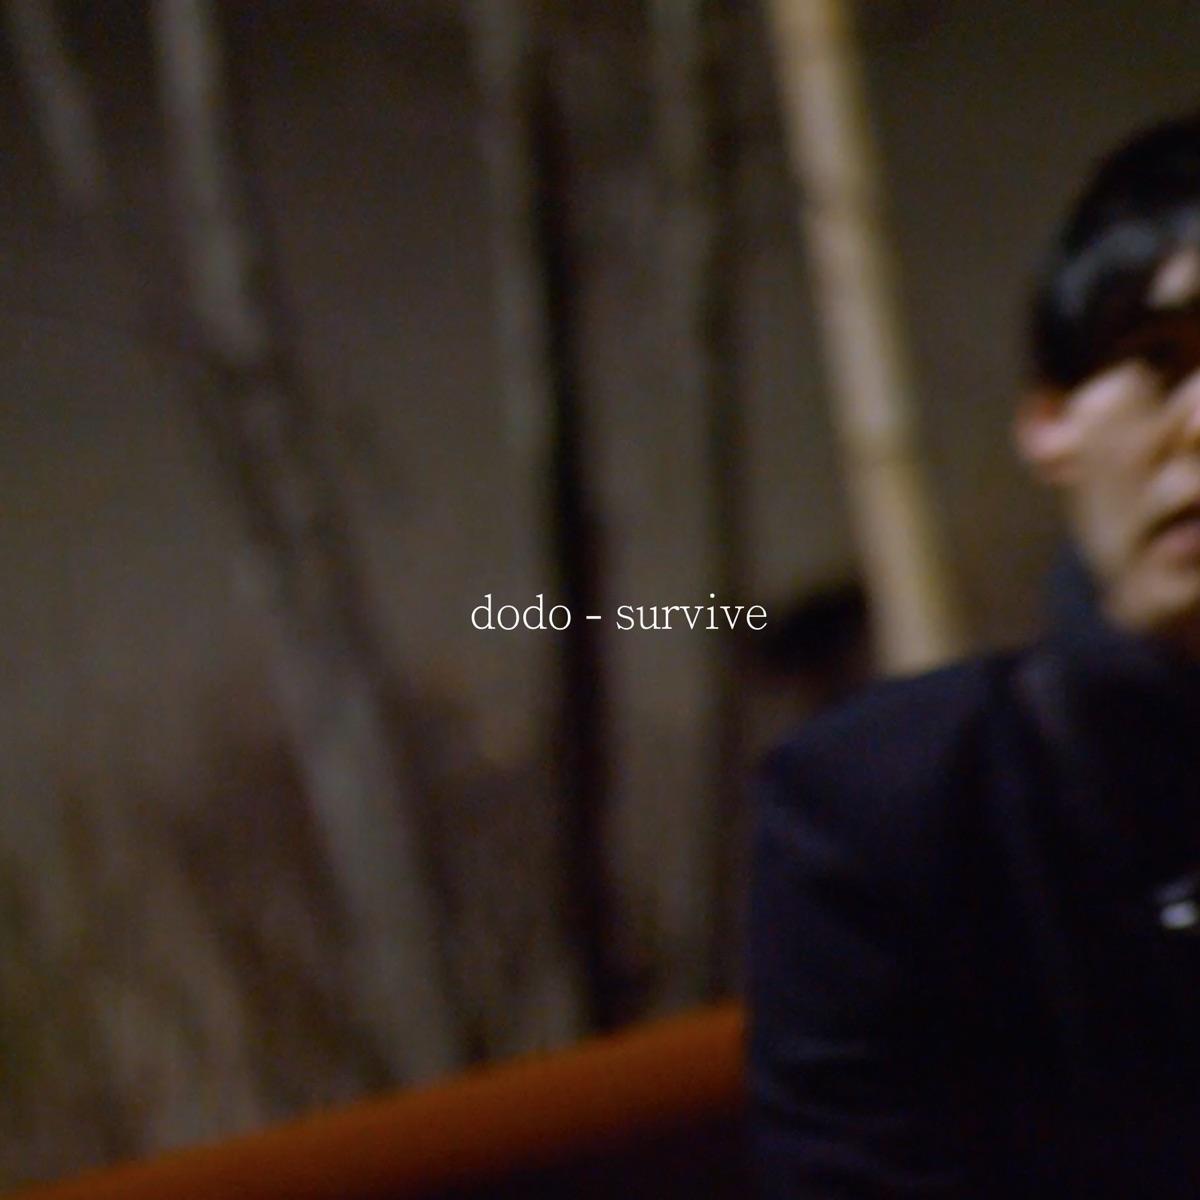 『dodo - survive 歌詞』収録の『survive』ジャケット